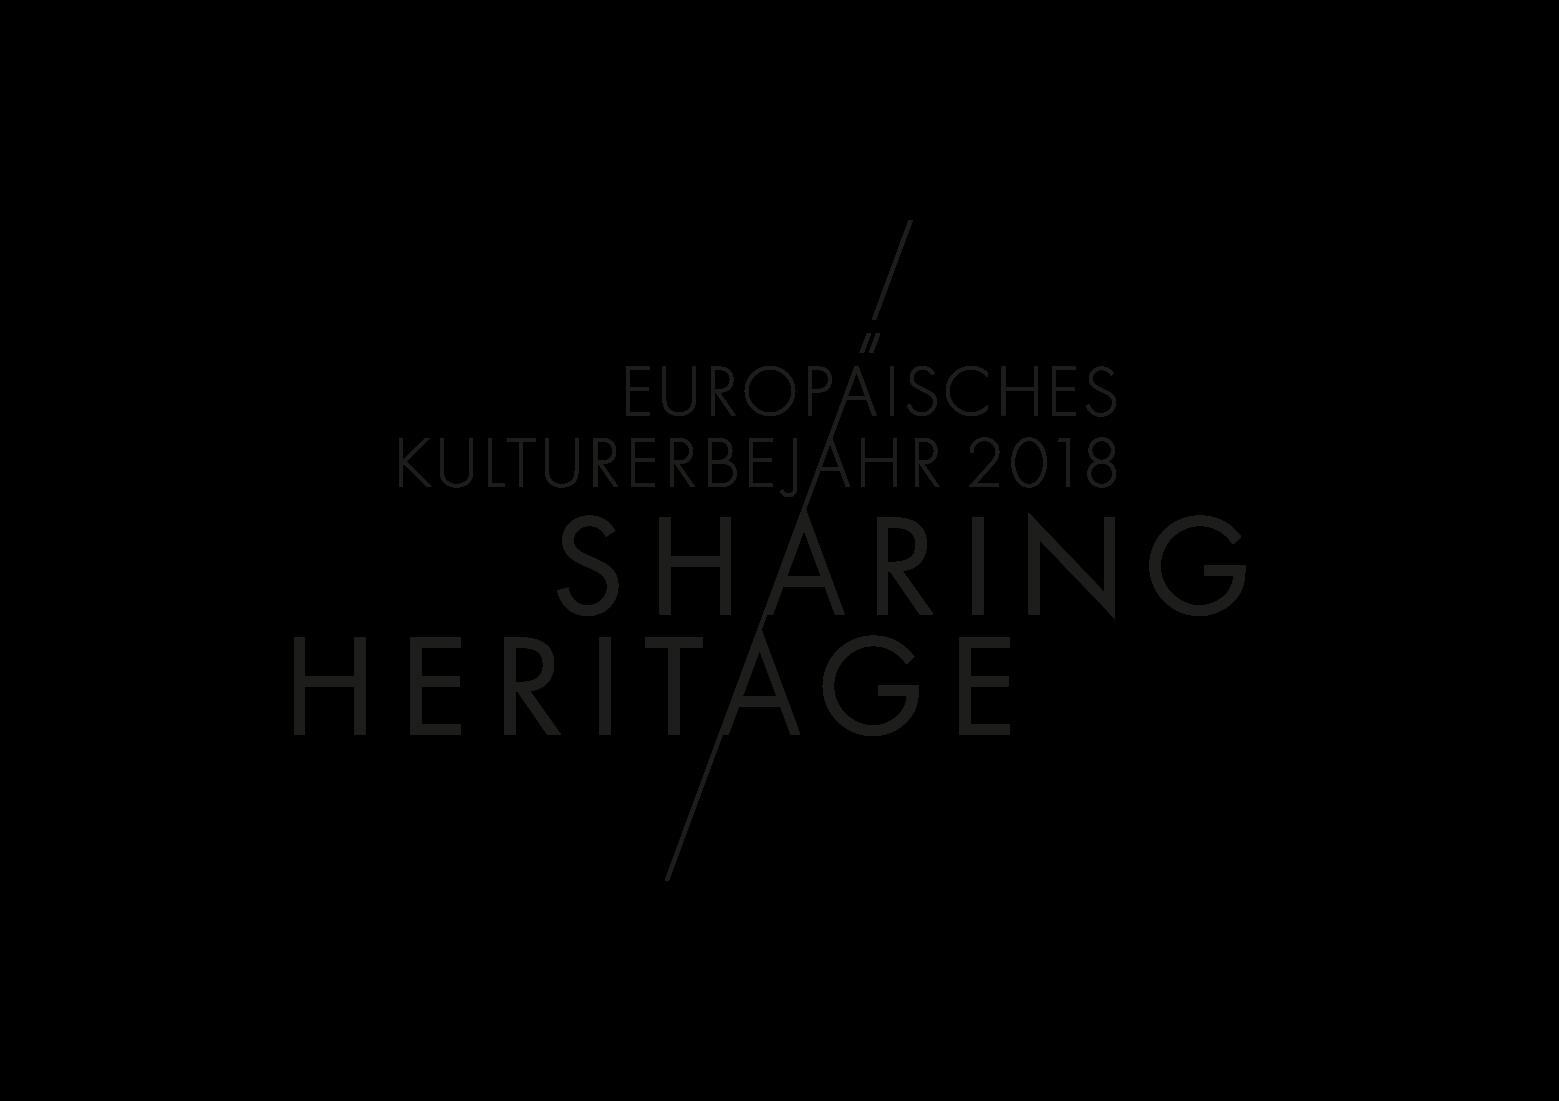 Sharing Heritage